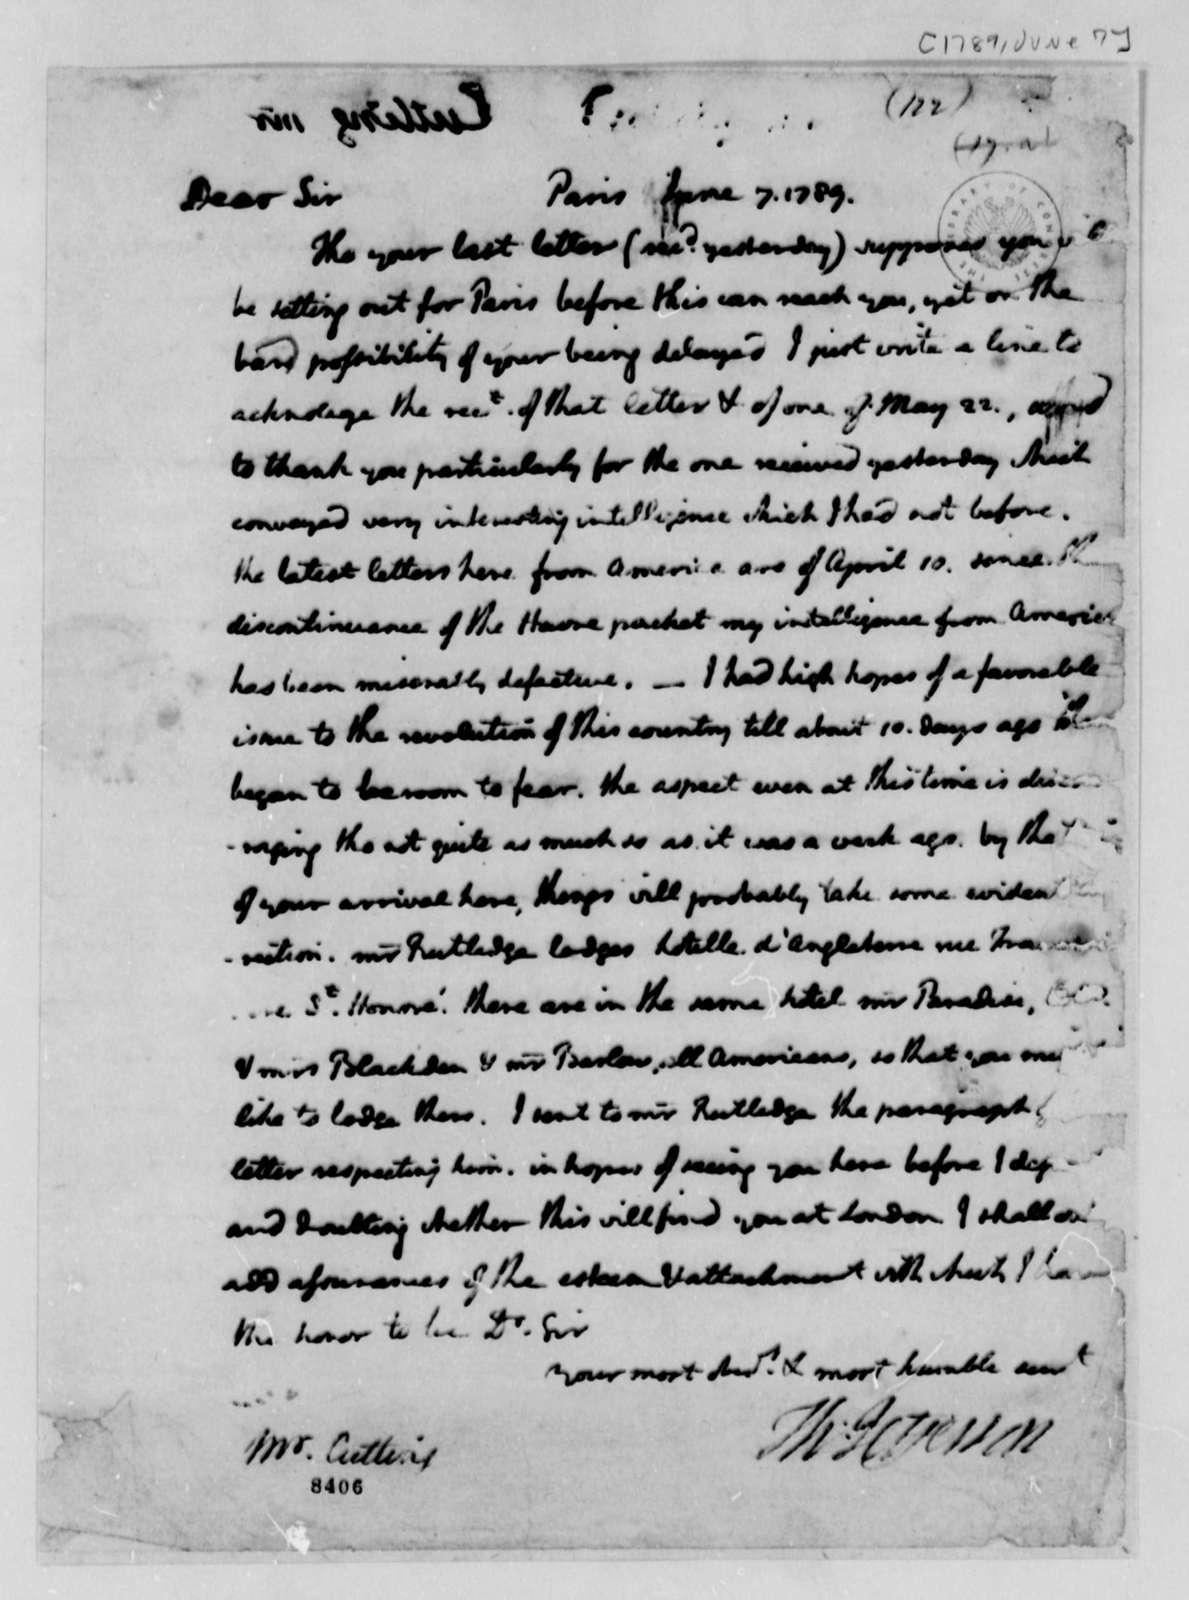 Thomas Jefferson to John B. Cutting, June 7, 1789, France